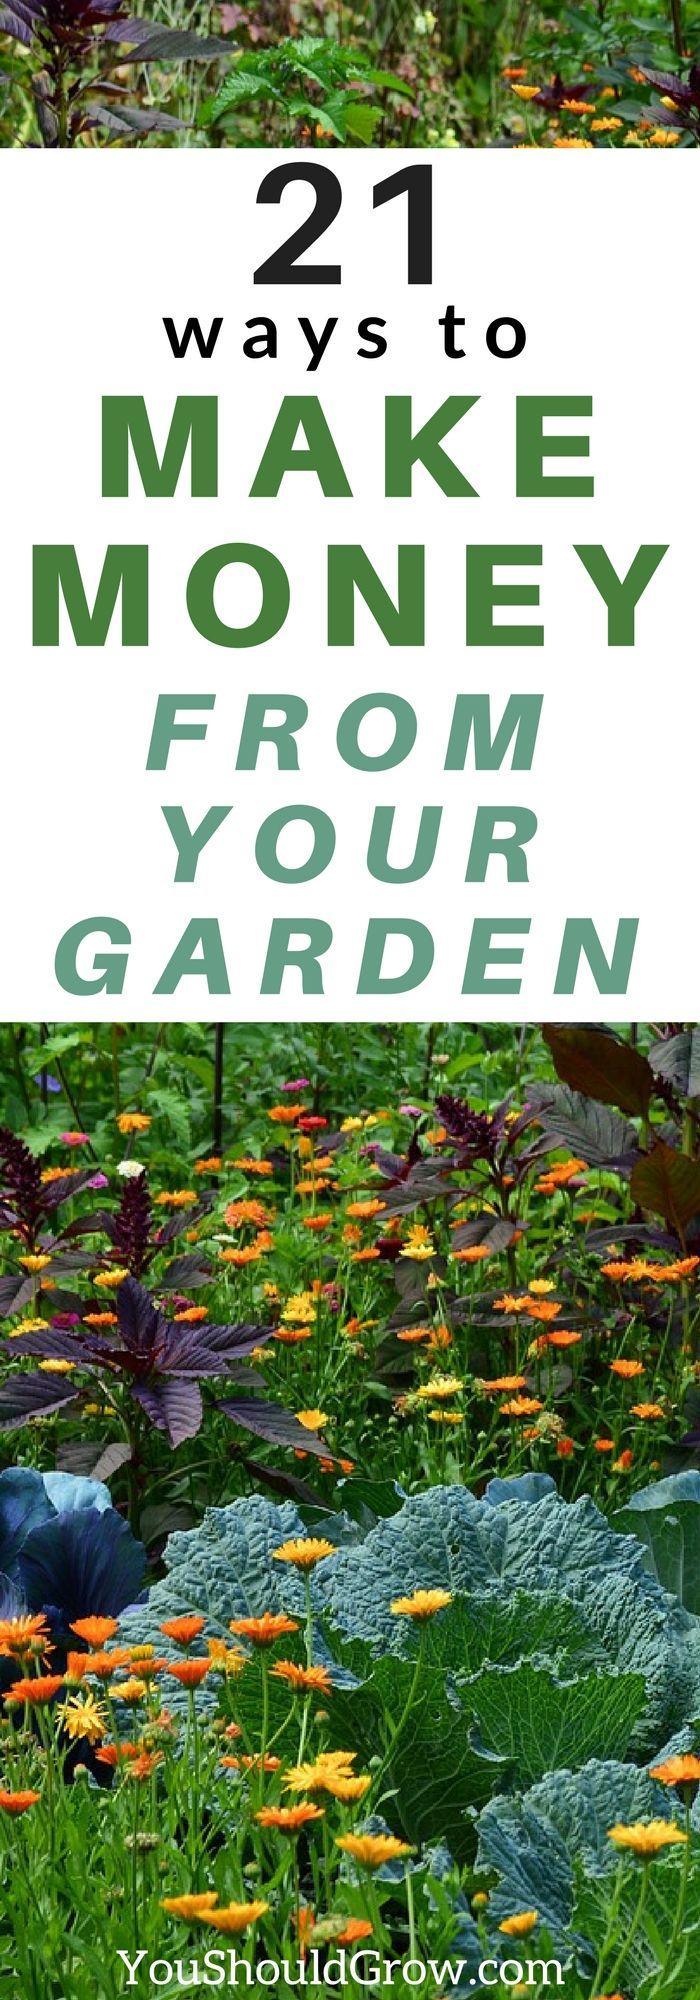 Make Money Gardening 29 Ideas To Start Earning Now Gardening For Beginners Organic Gardening Tips Organic Gardening Backyard gardening for profit